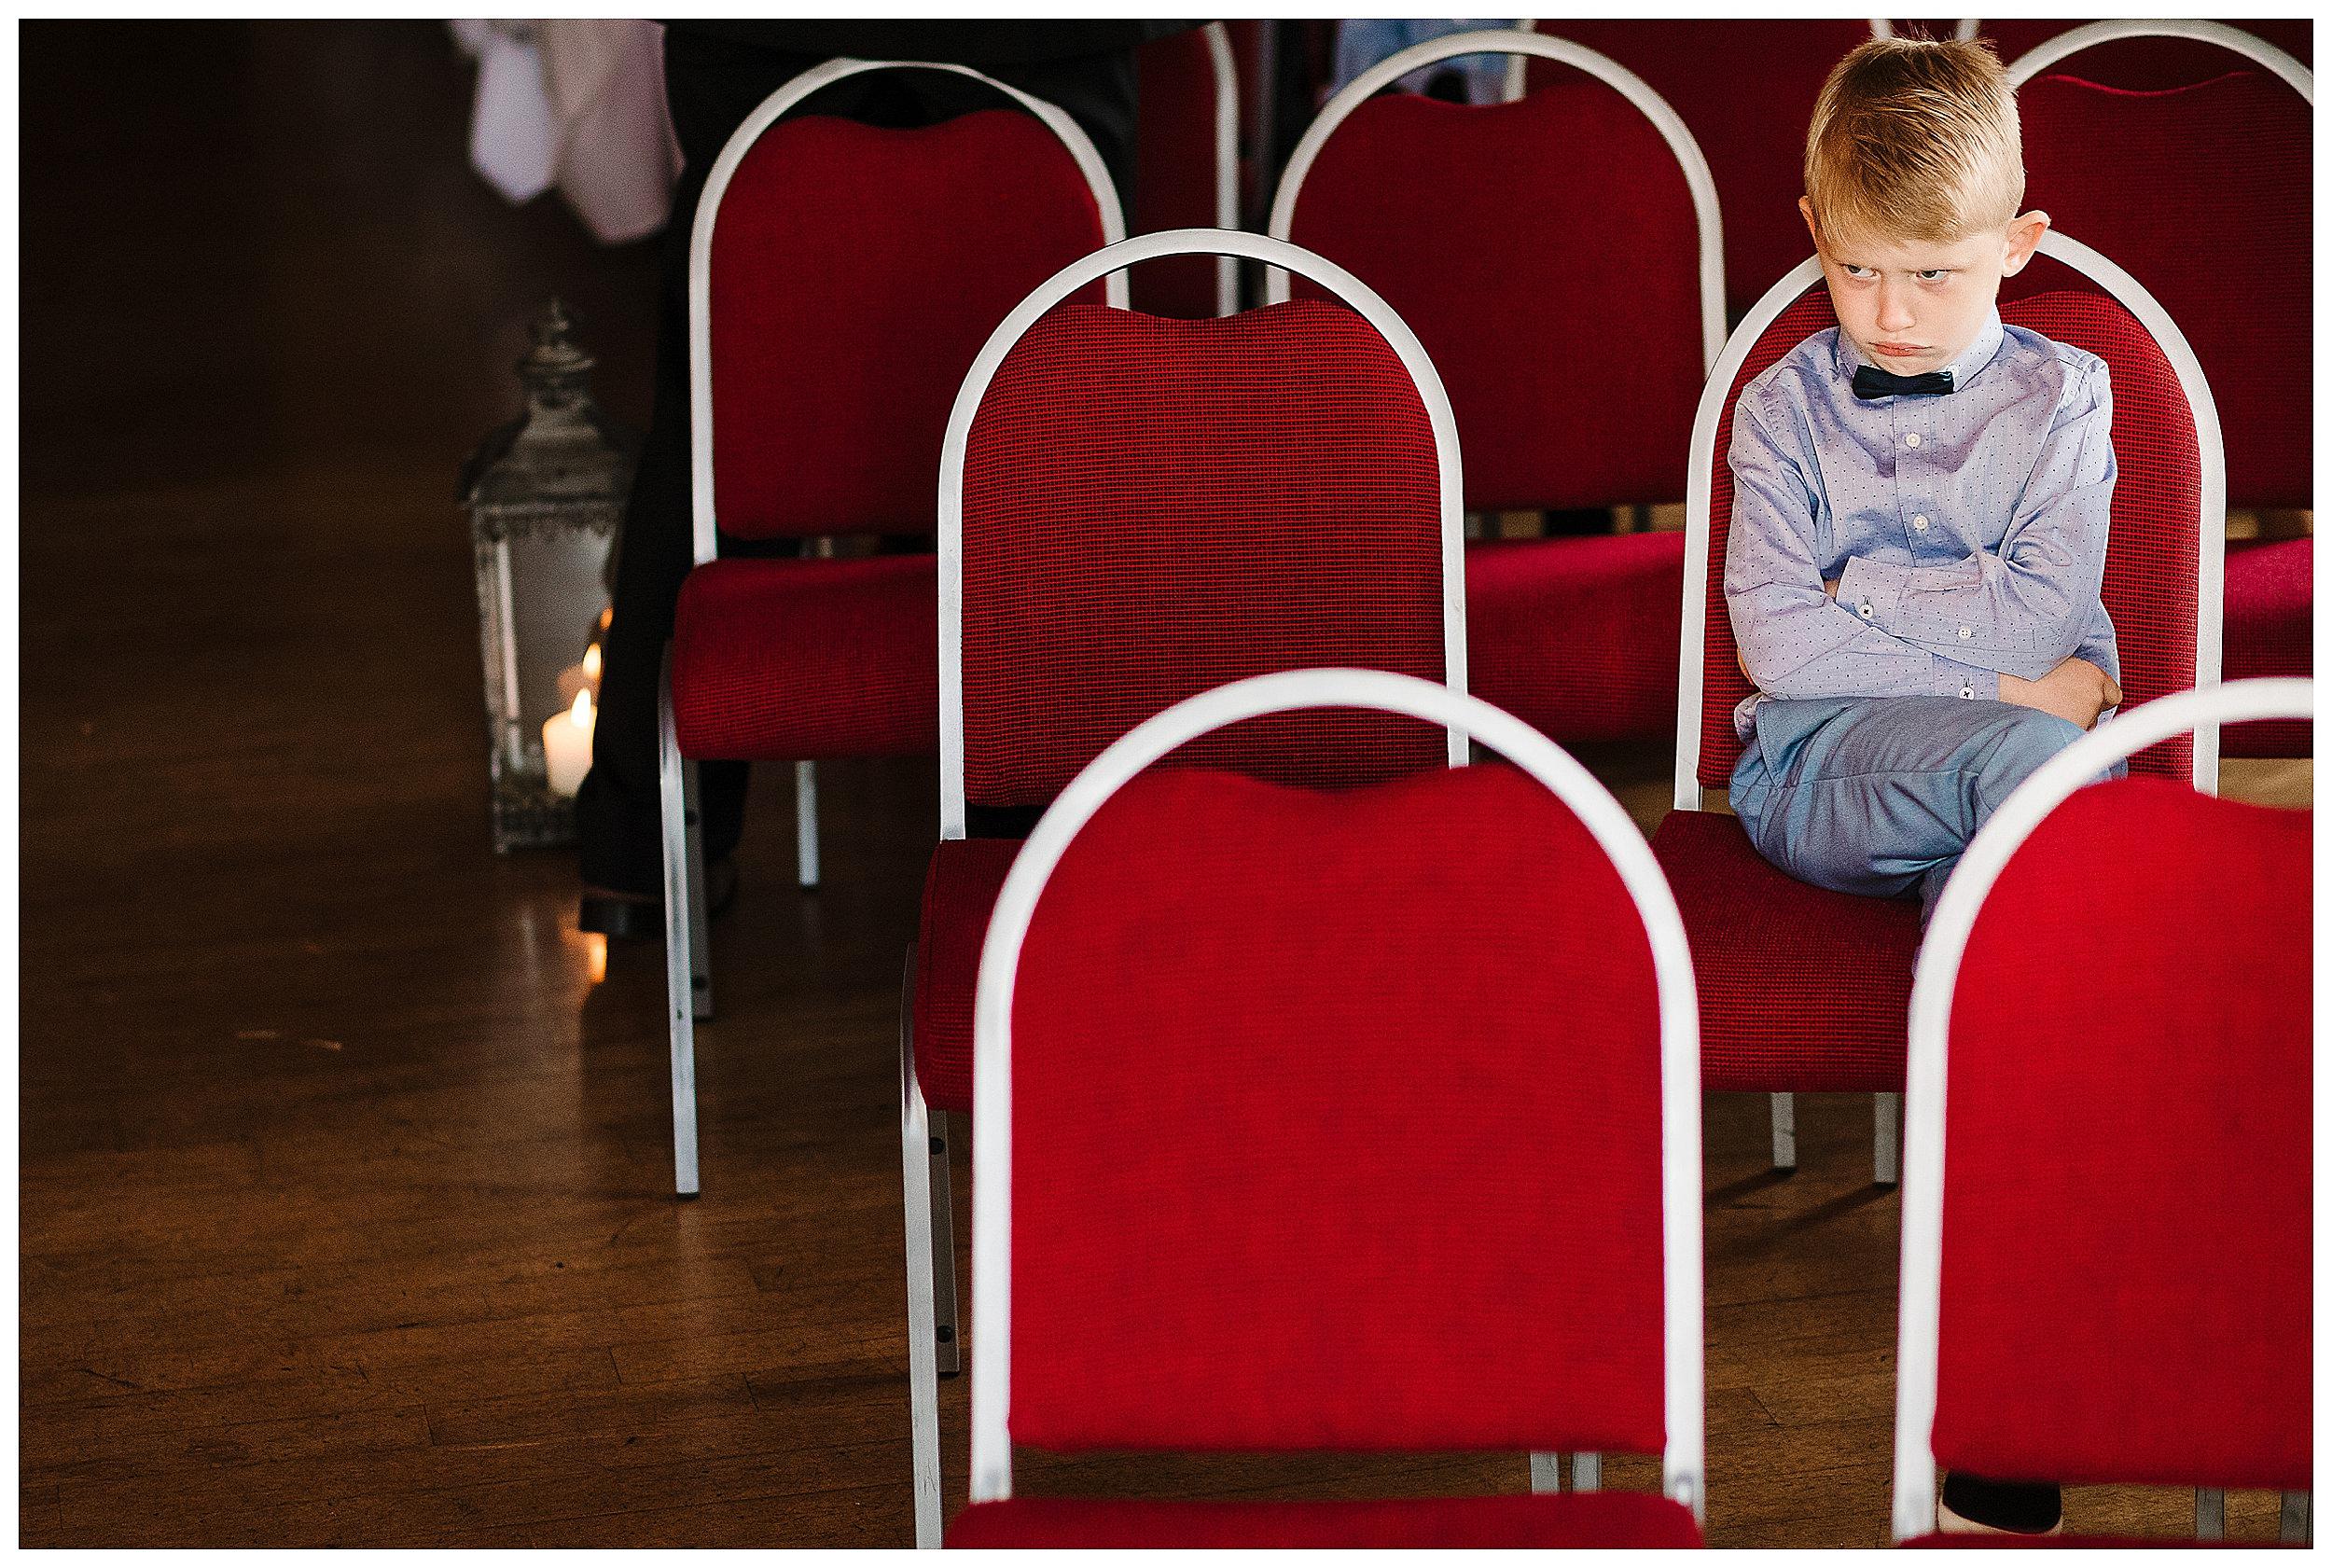 A little boy looking grumpy at a wedding